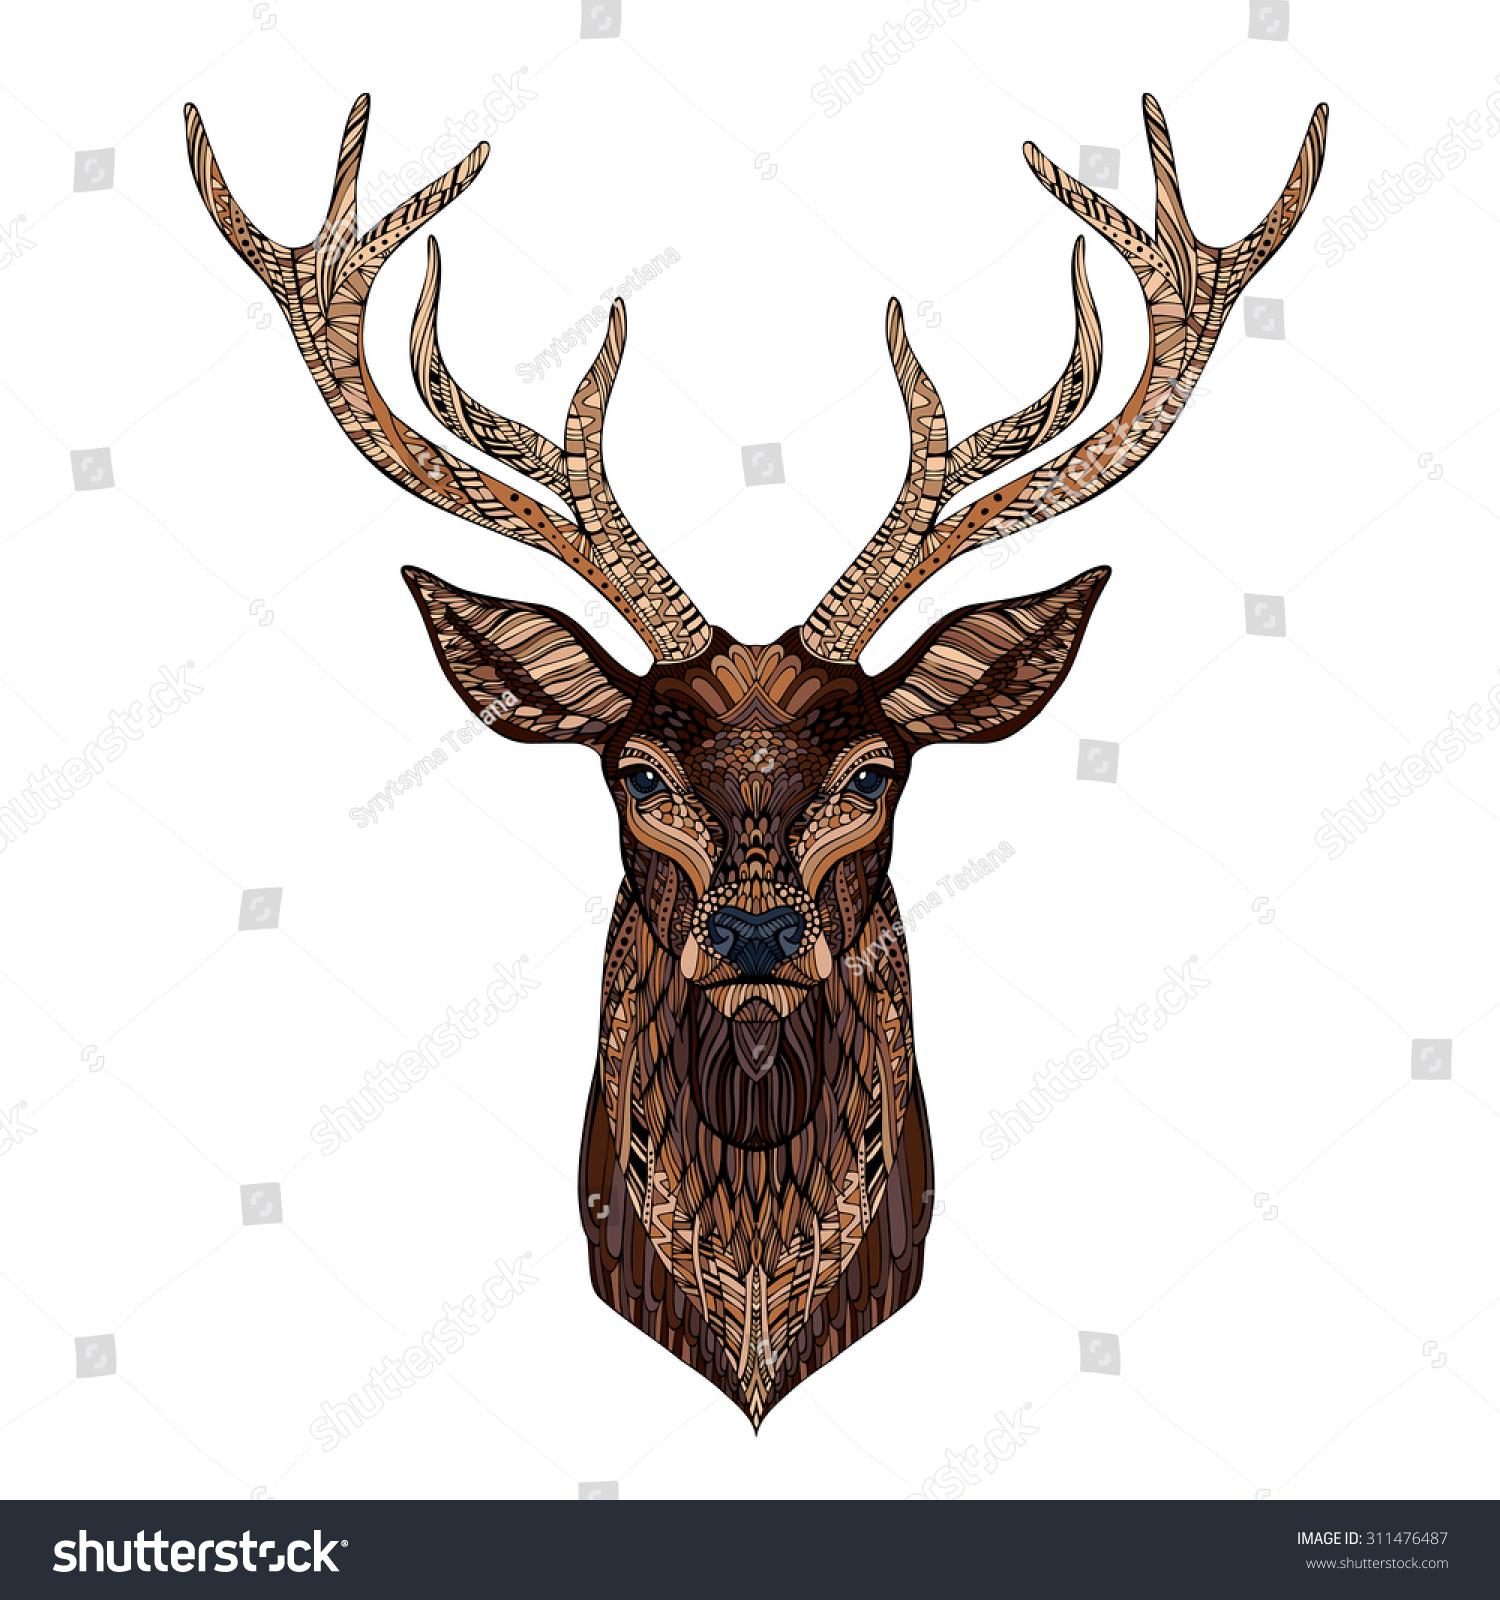 deer head stylized zentangle style tribal stock vector 311476487 shutterstock. Black Bedroom Furniture Sets. Home Design Ideas